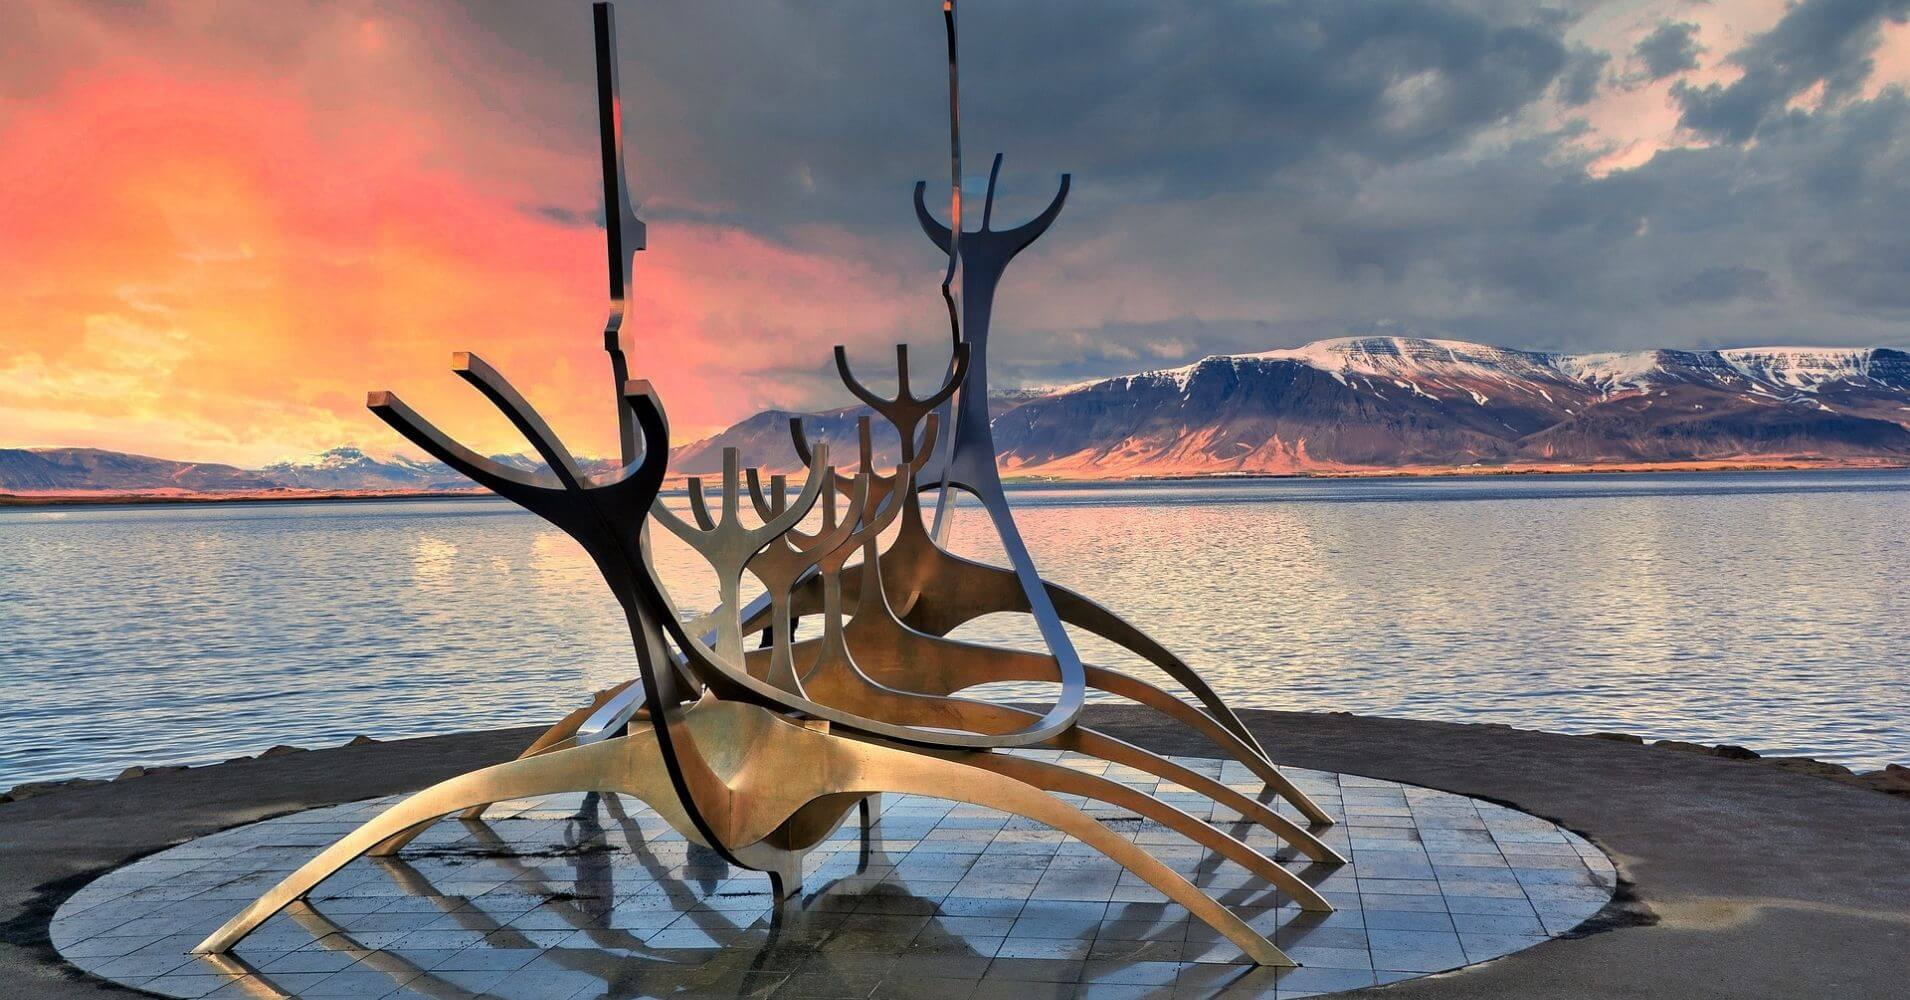 Viajero del Sol. Reykjavík, Islandia.